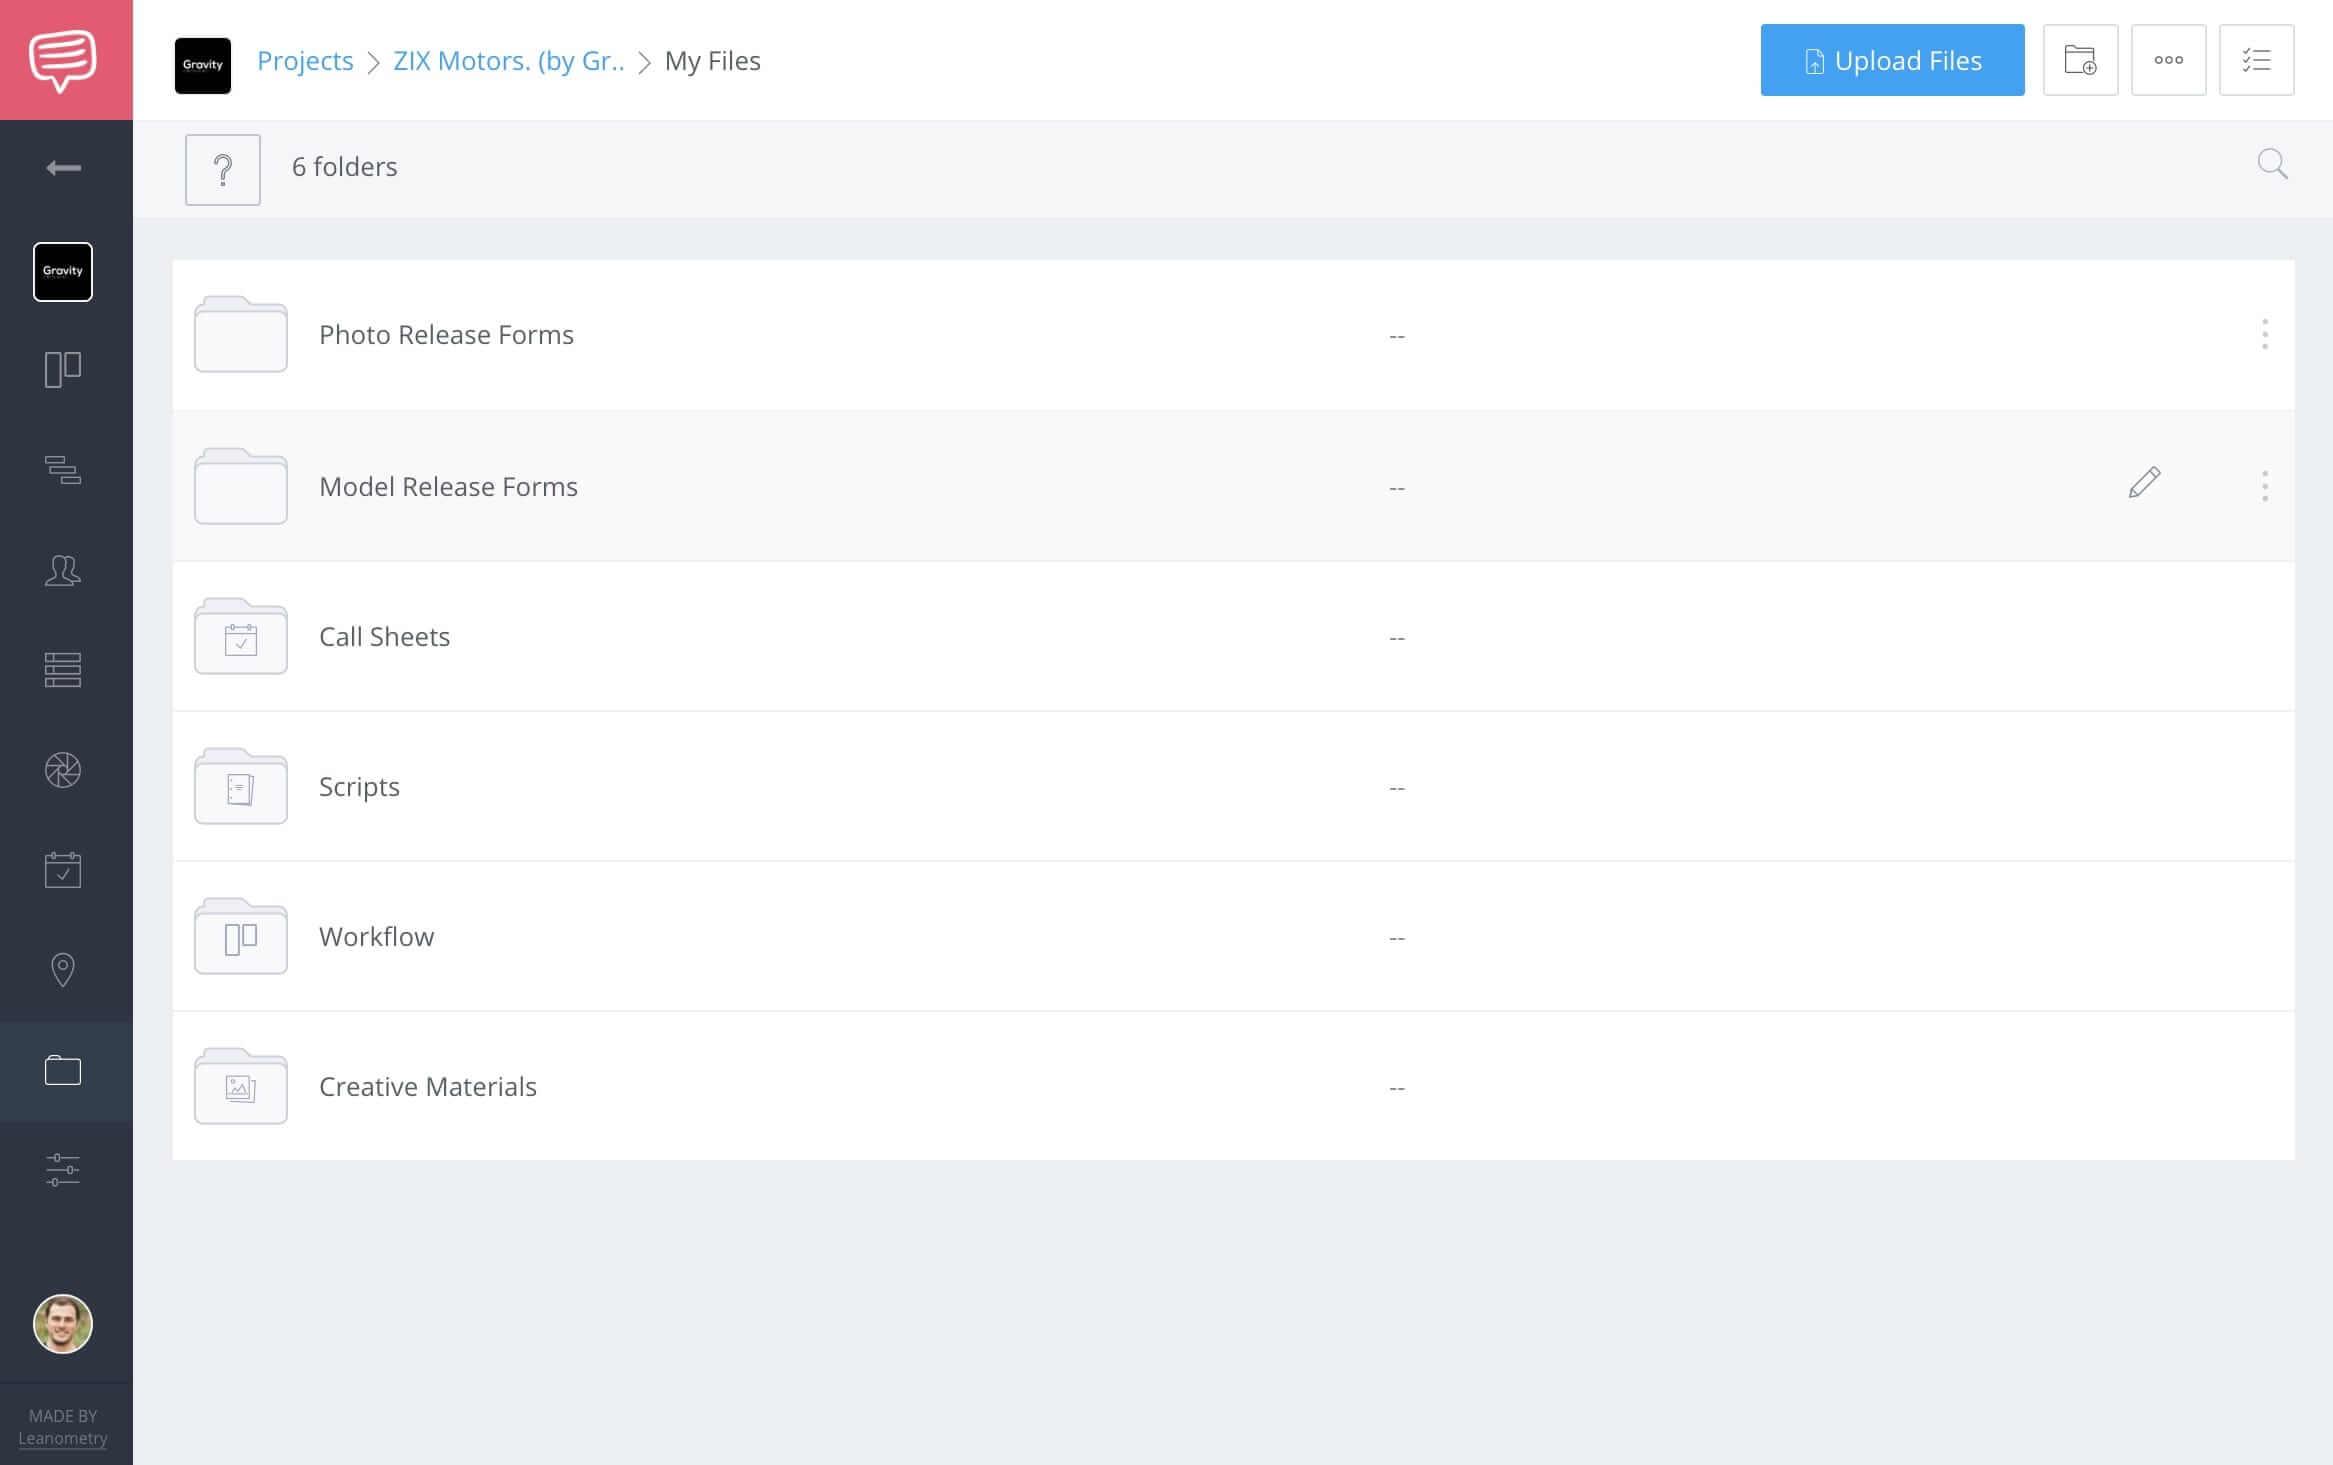 Model Release Form Template   Backup Files To StudioBinder